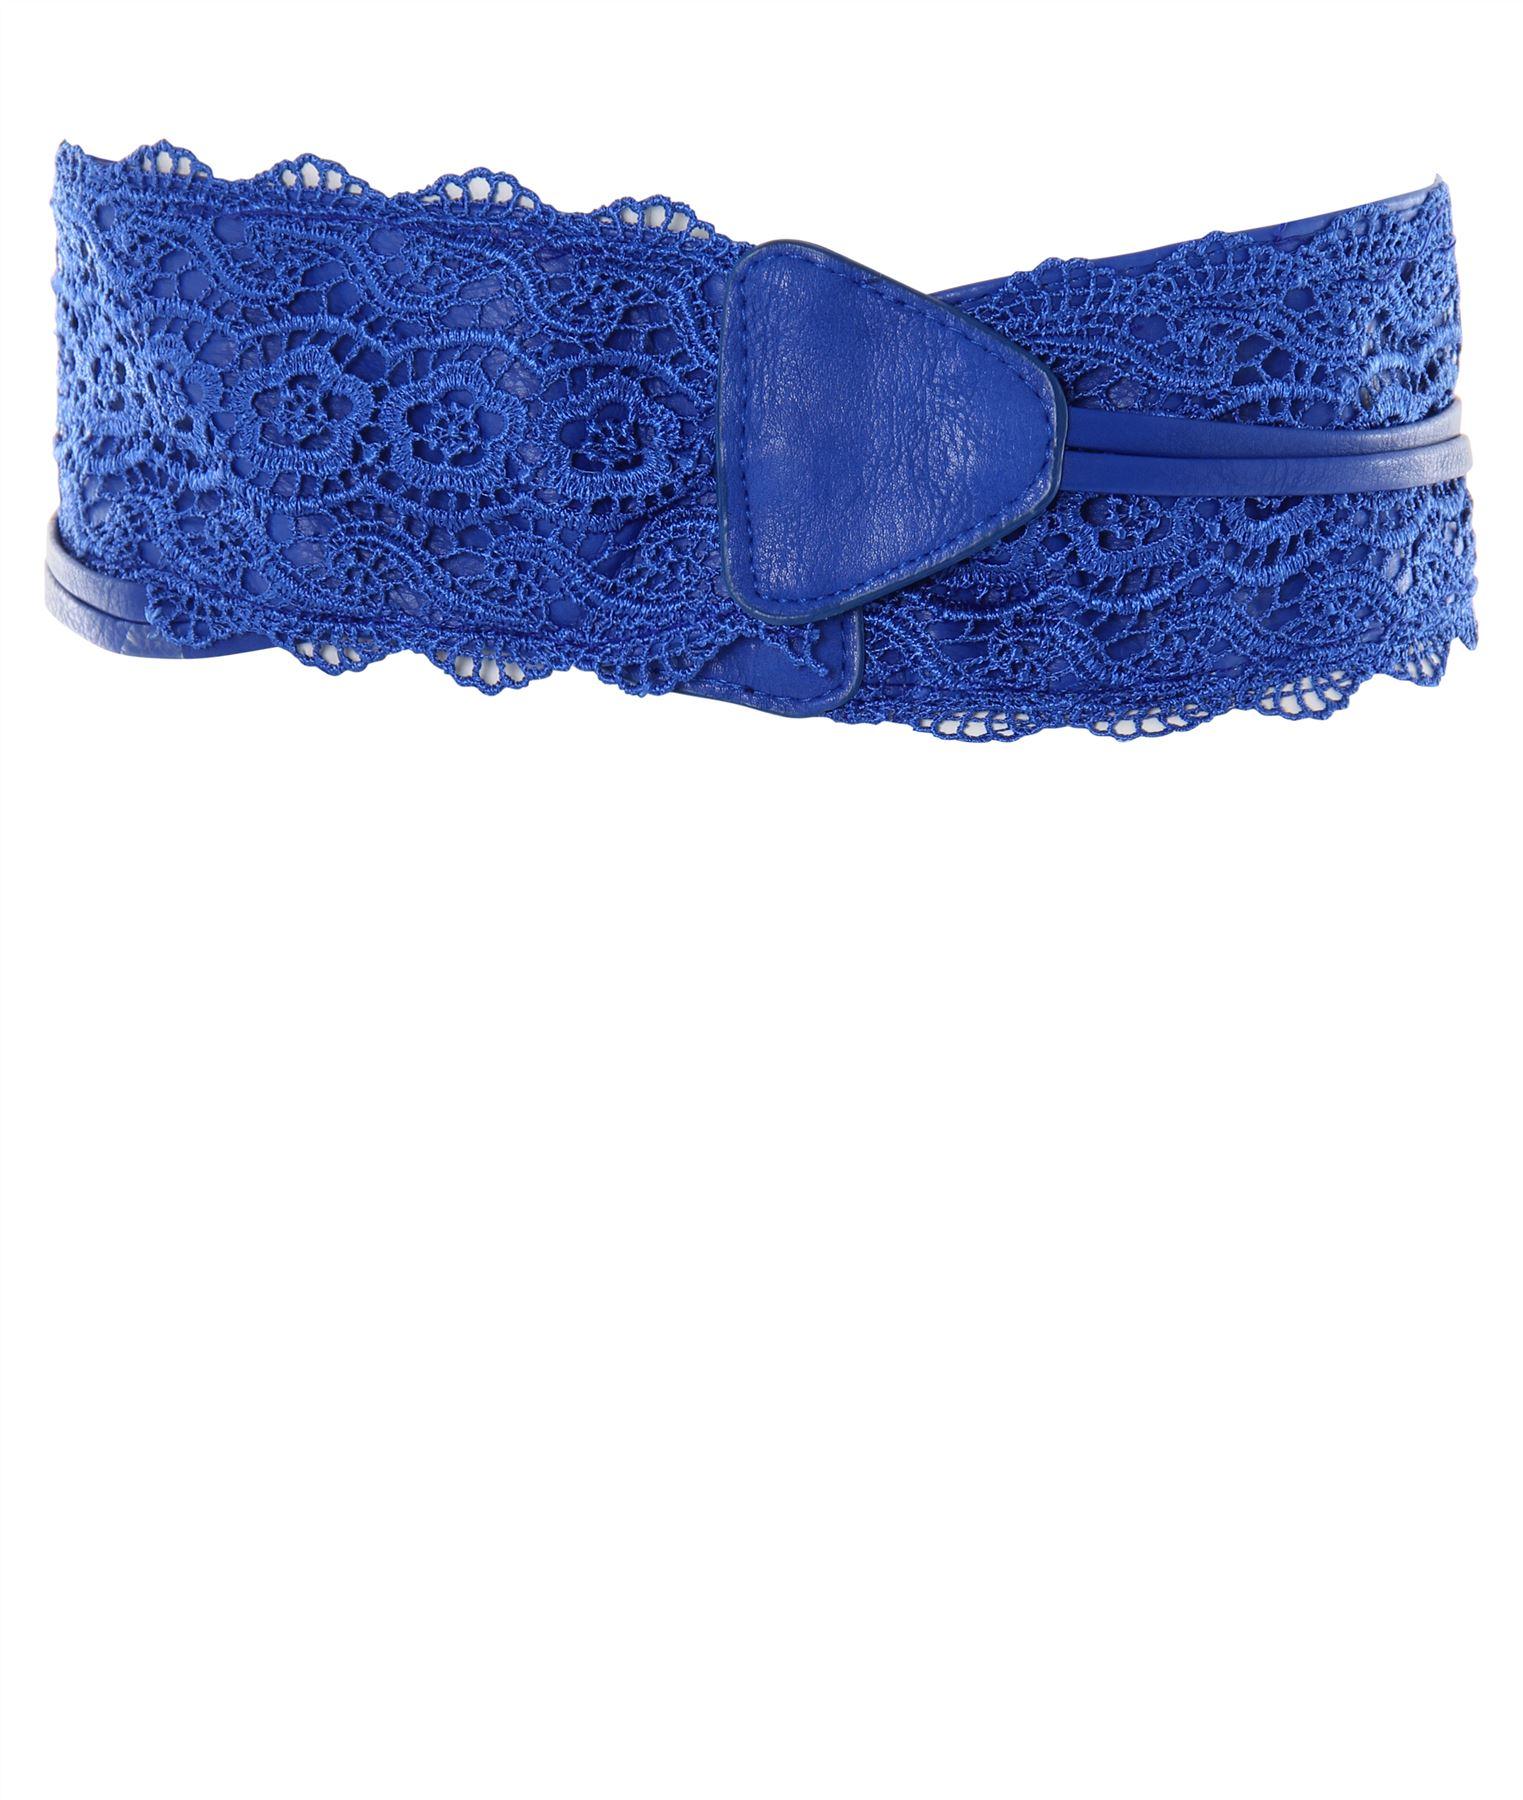 thumbnail 51 - Womens-Ladies-Wide-Waist-Belt-Floral-Waistband-Pattern-Band-Crochet-Lace-Corset